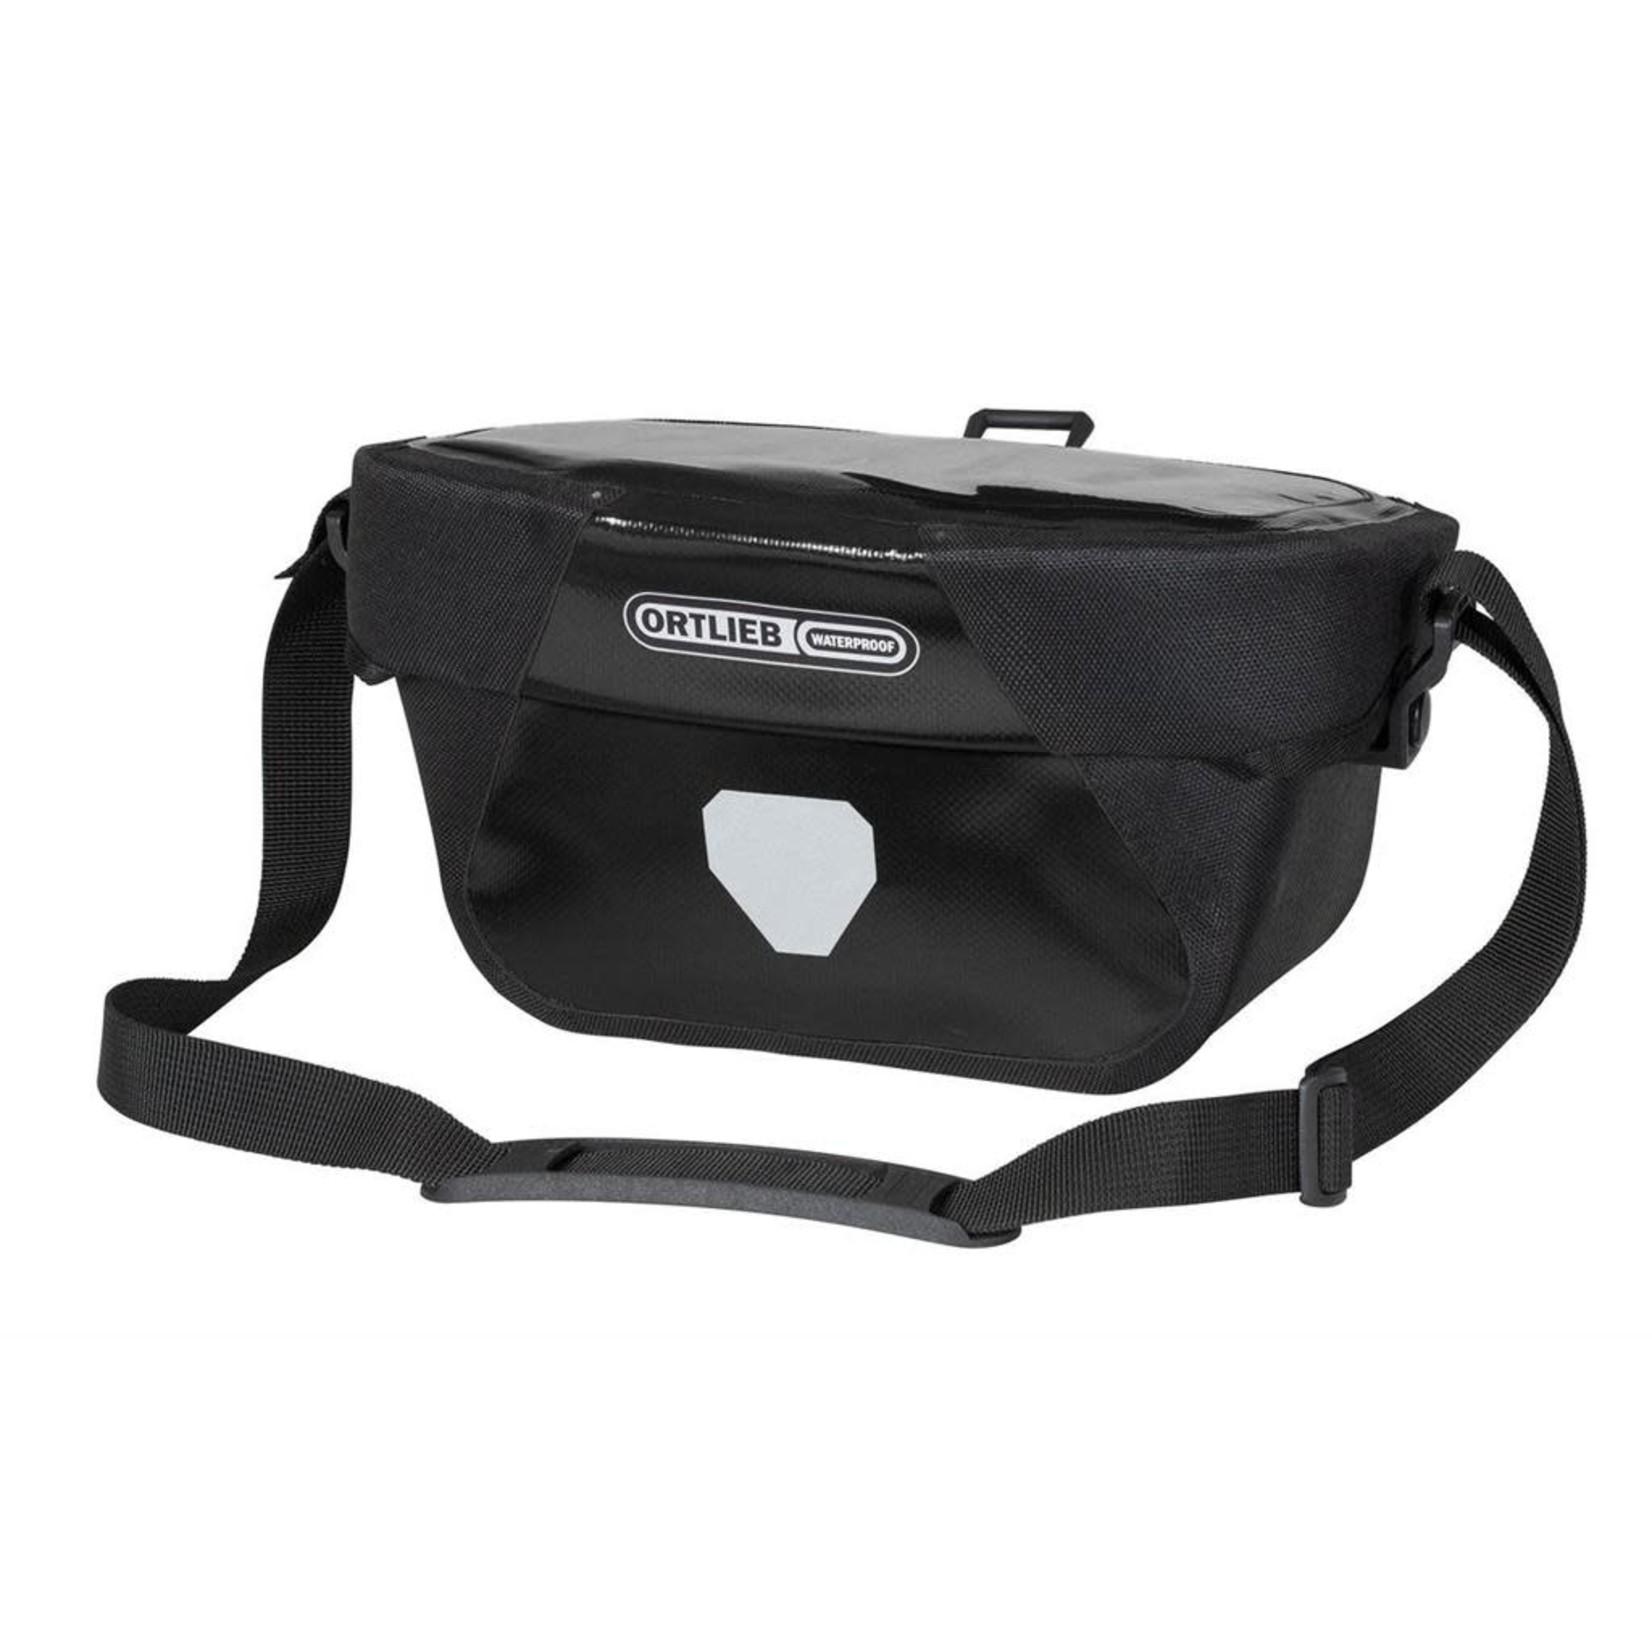 Ortlieb Ortlieb Ultimate6 S Handlebar Bag